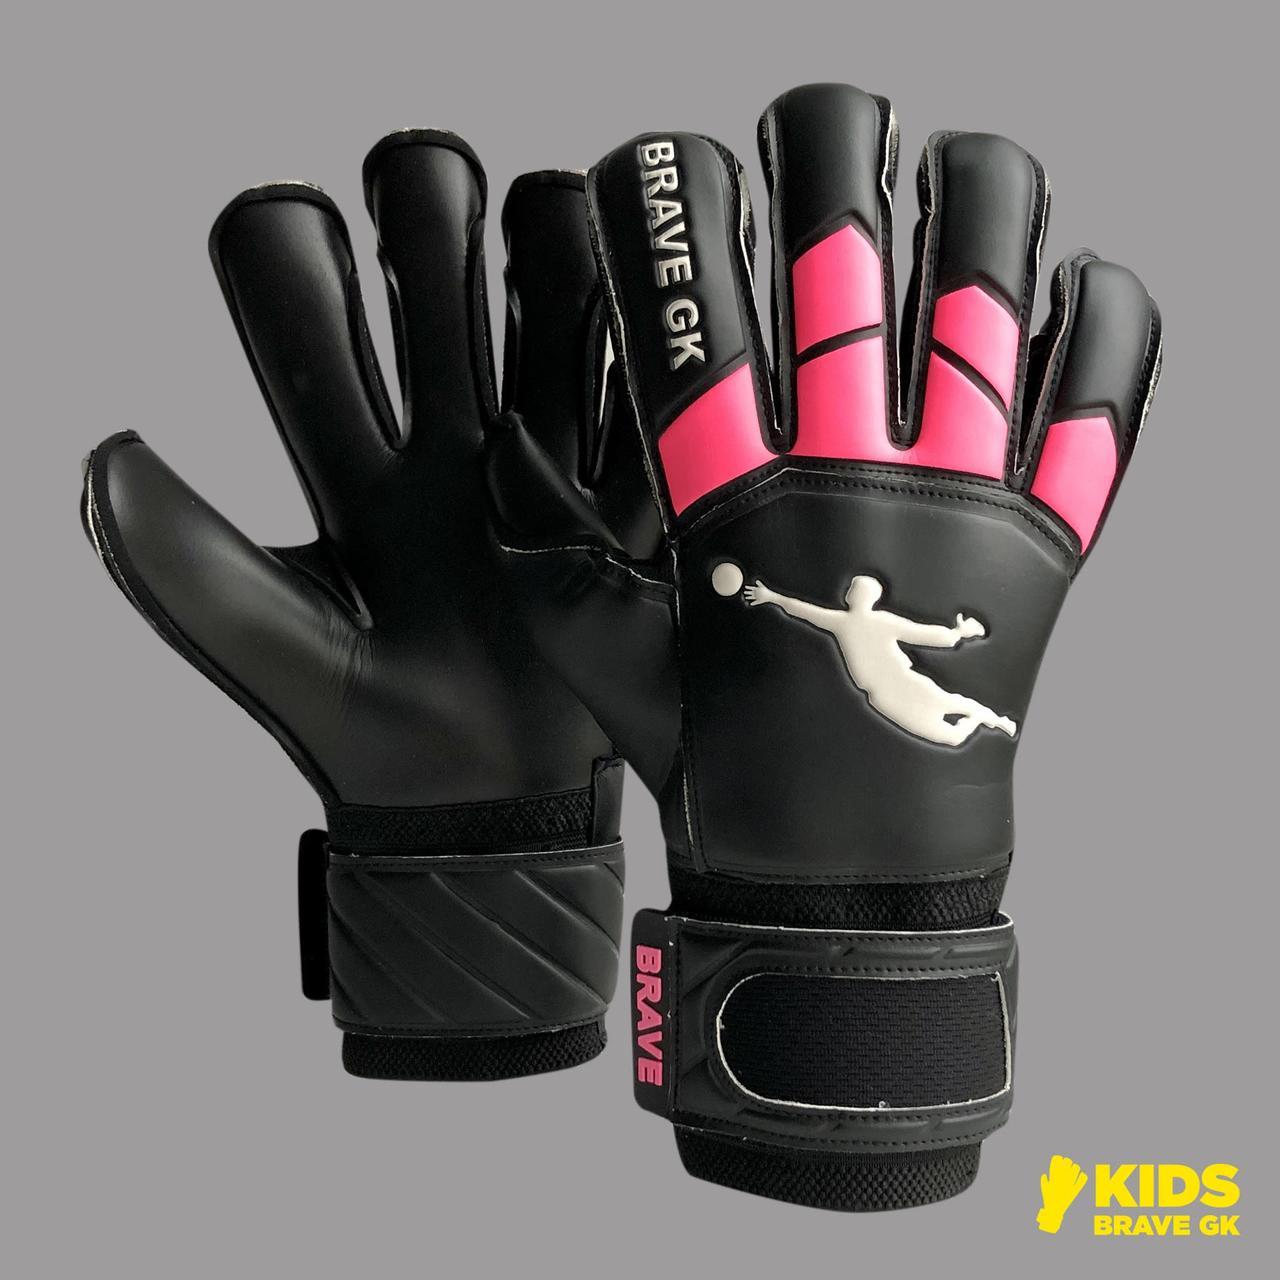 Перчатки вратарские BRAVE GK WINNER BLACK/PINK P.6